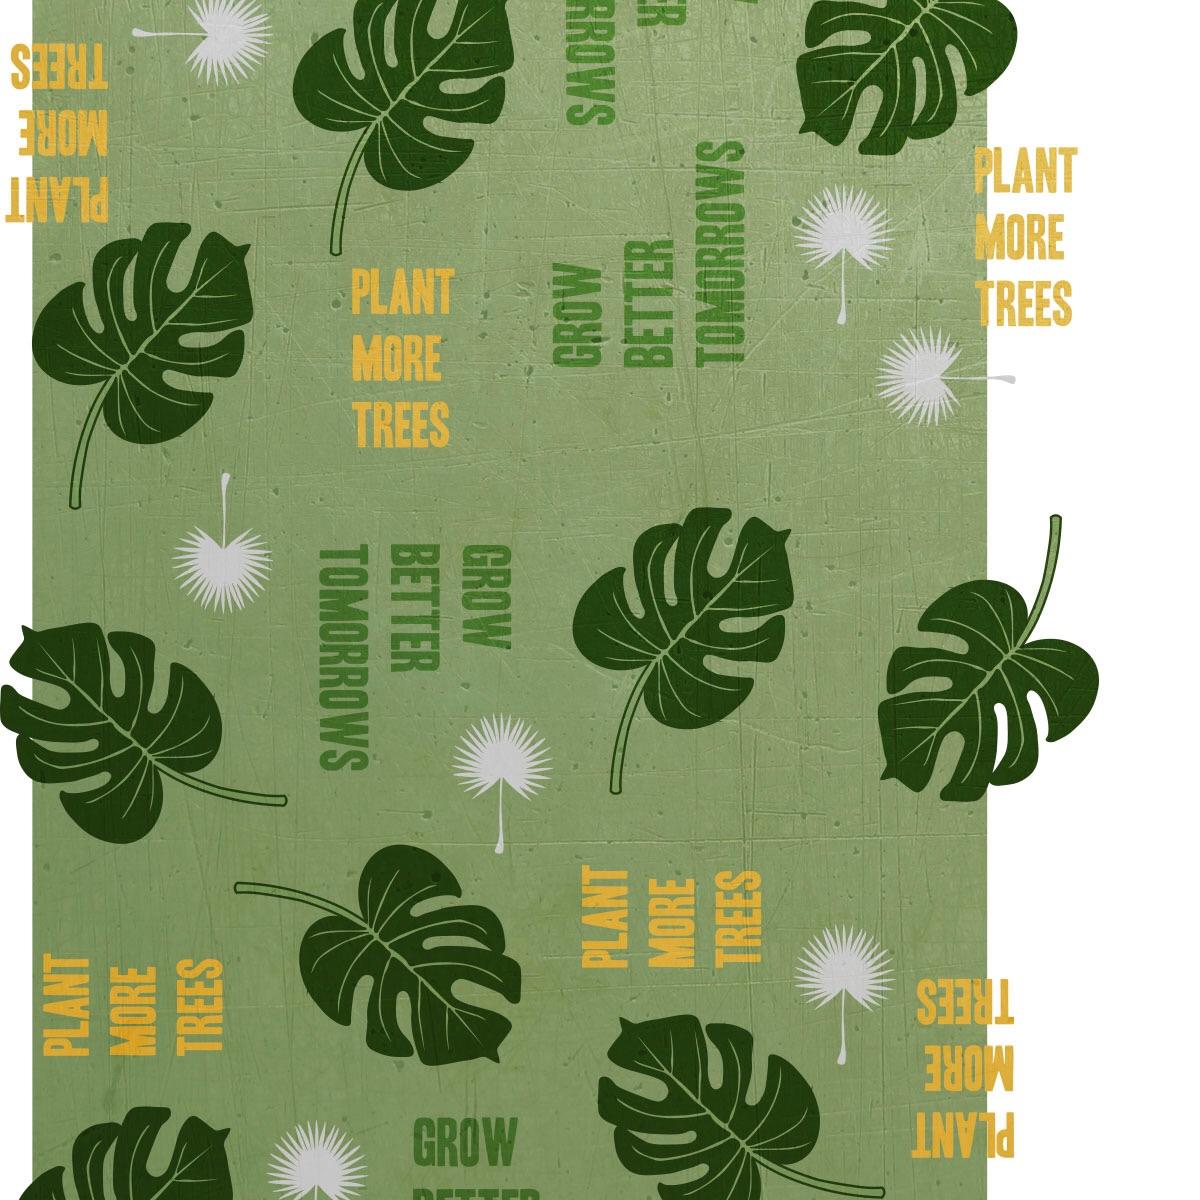 23 Plant More Trees.JPG